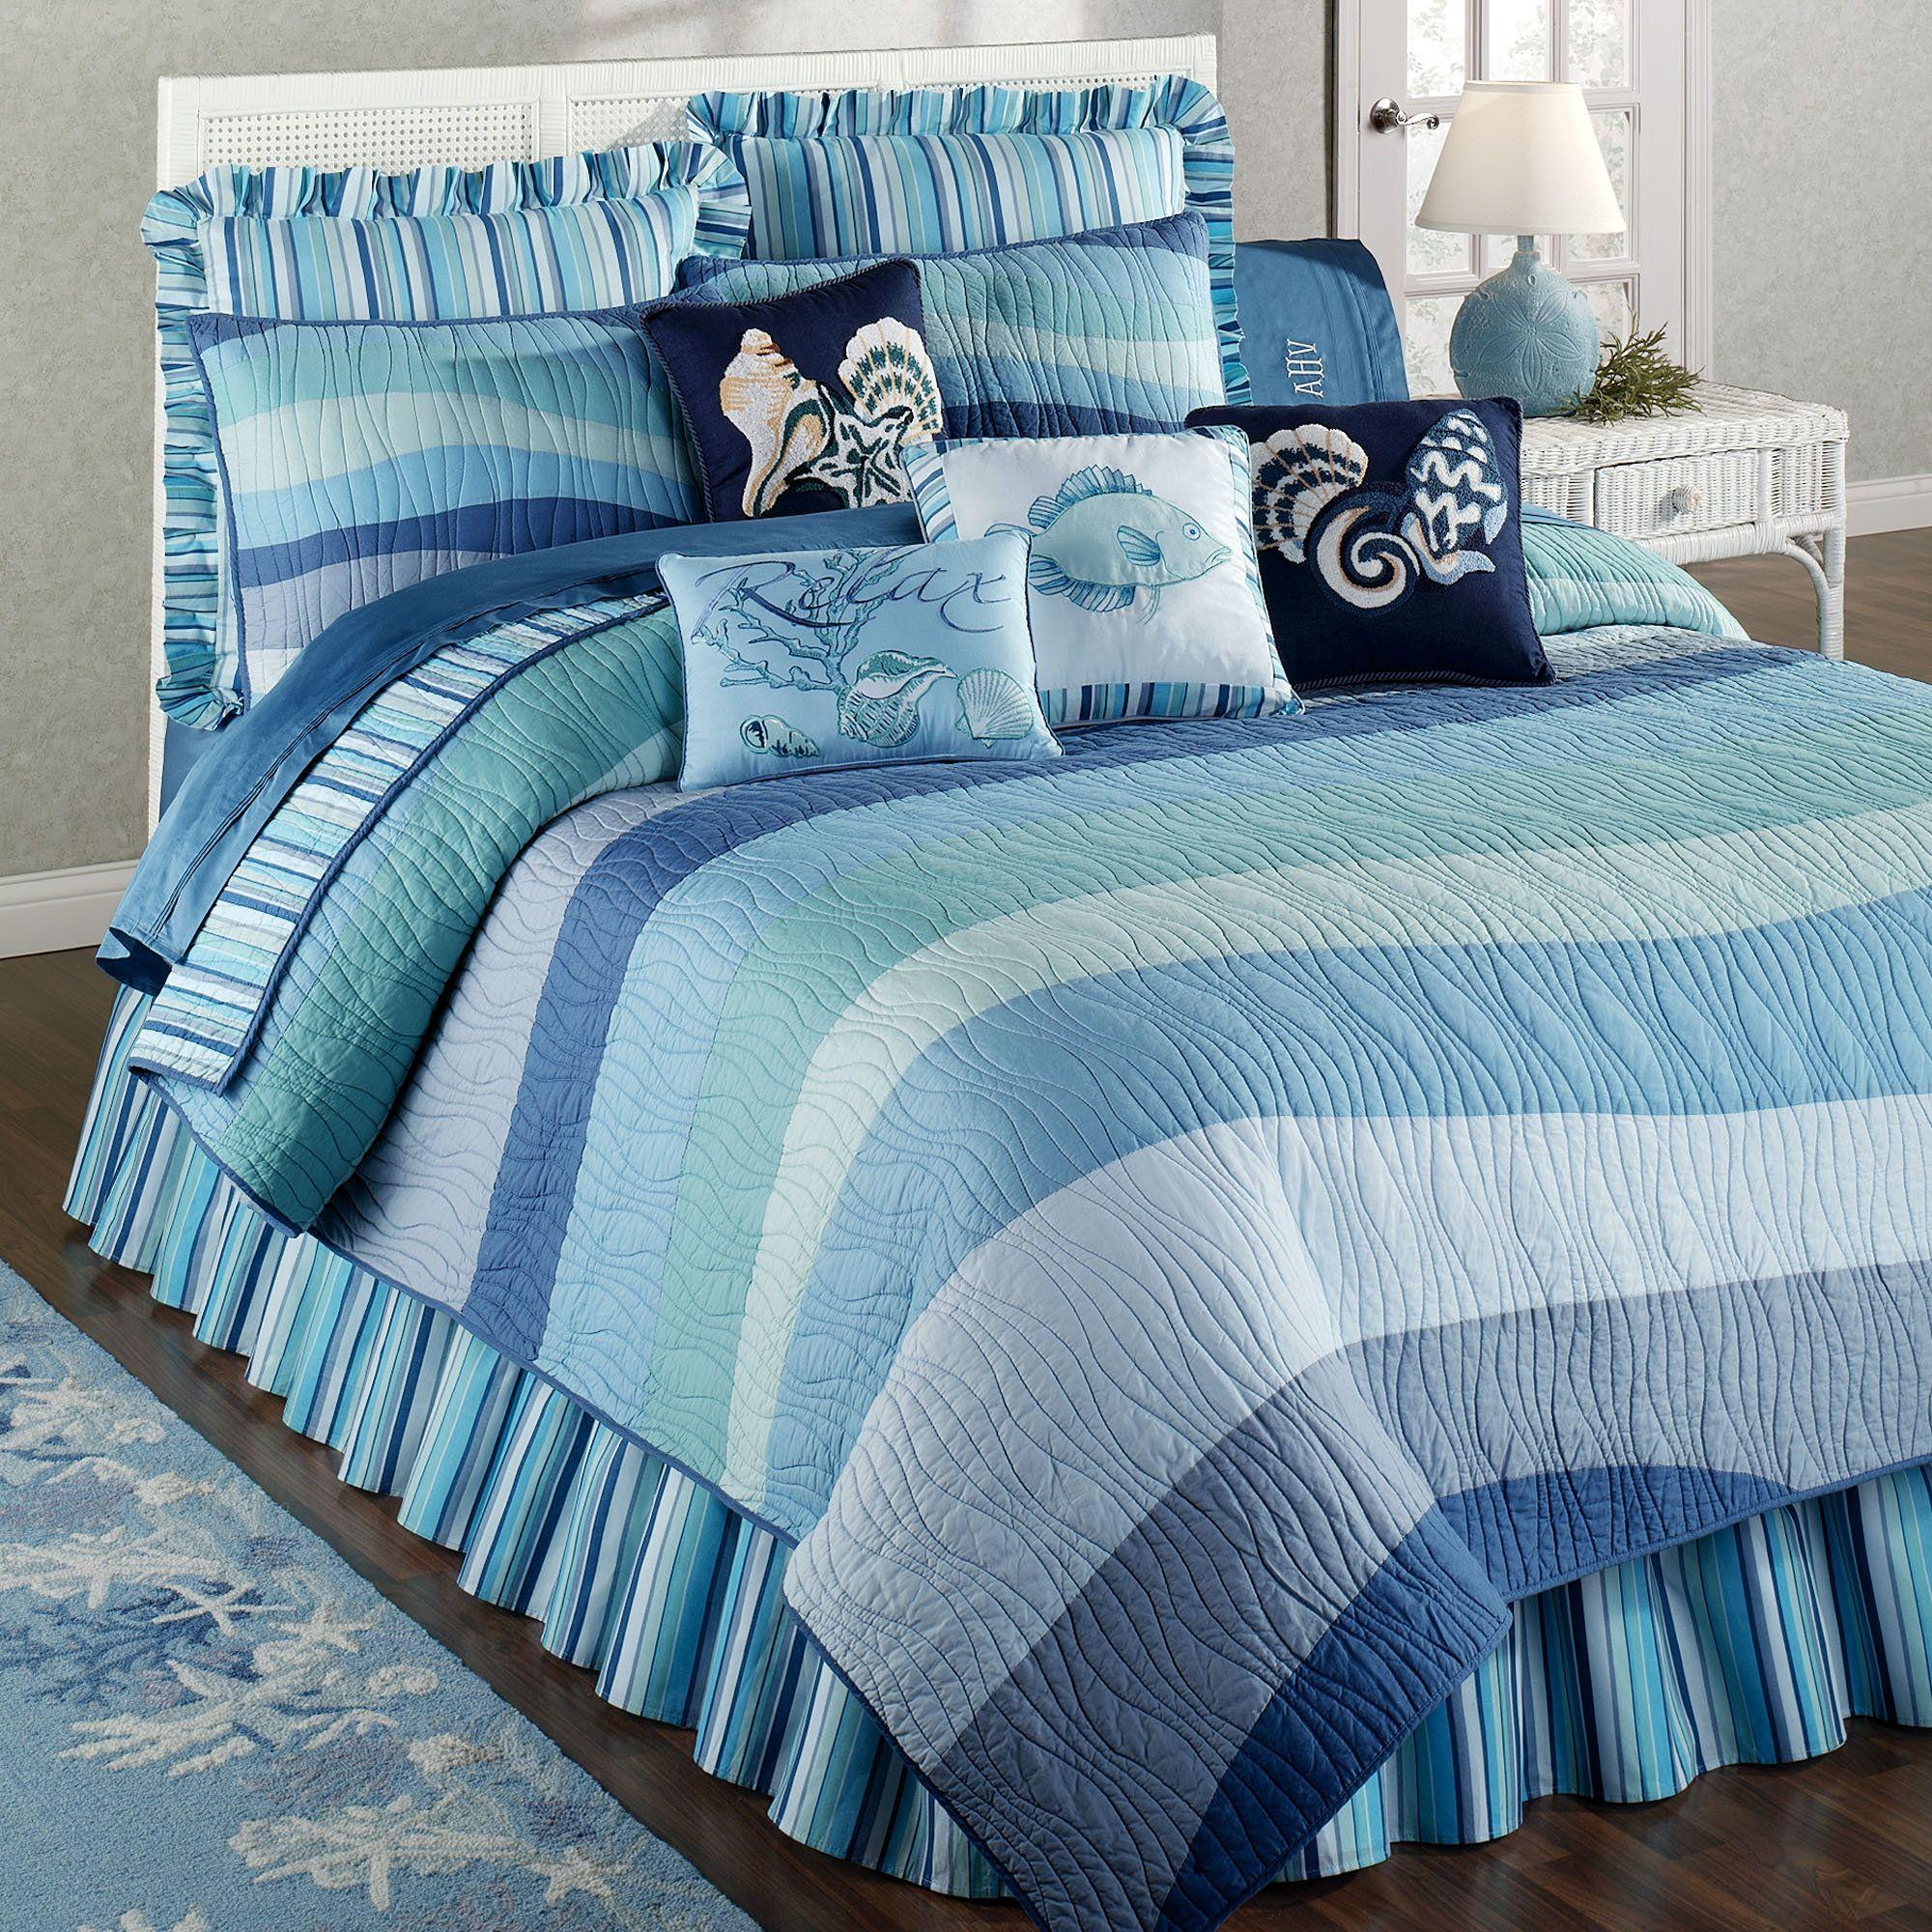 coastal life bedding blue cottage seashell beach bedspreads blue aqua water beach bedspreads ocean wave